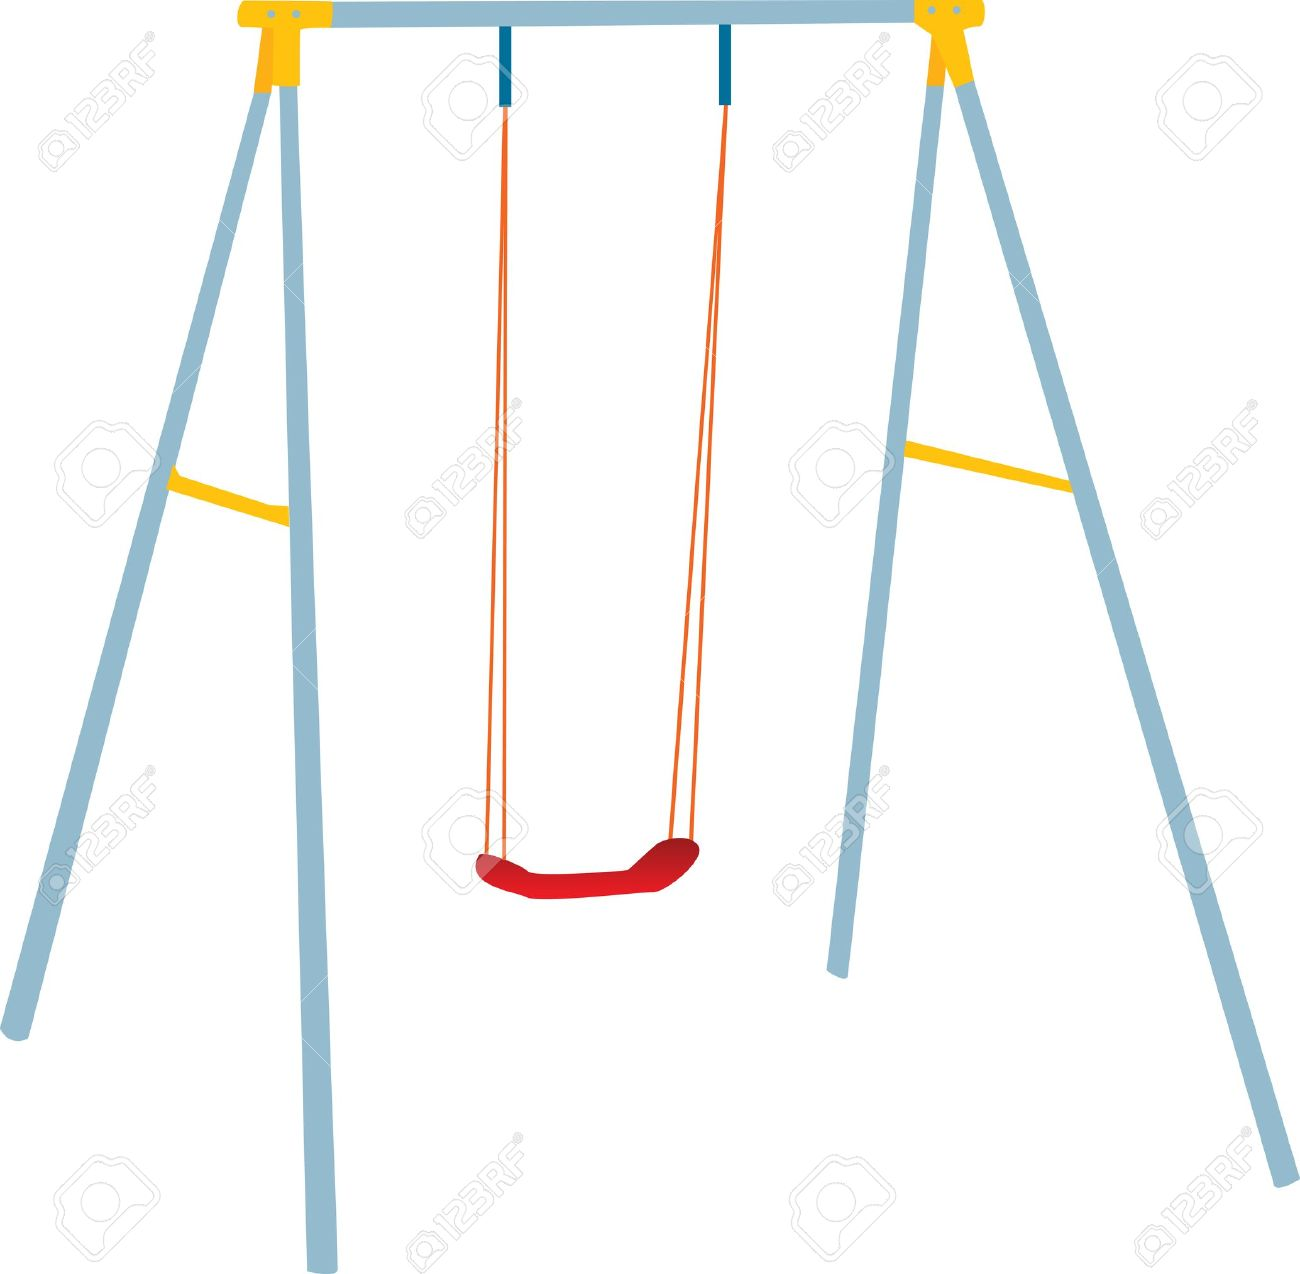 swing%20clipart